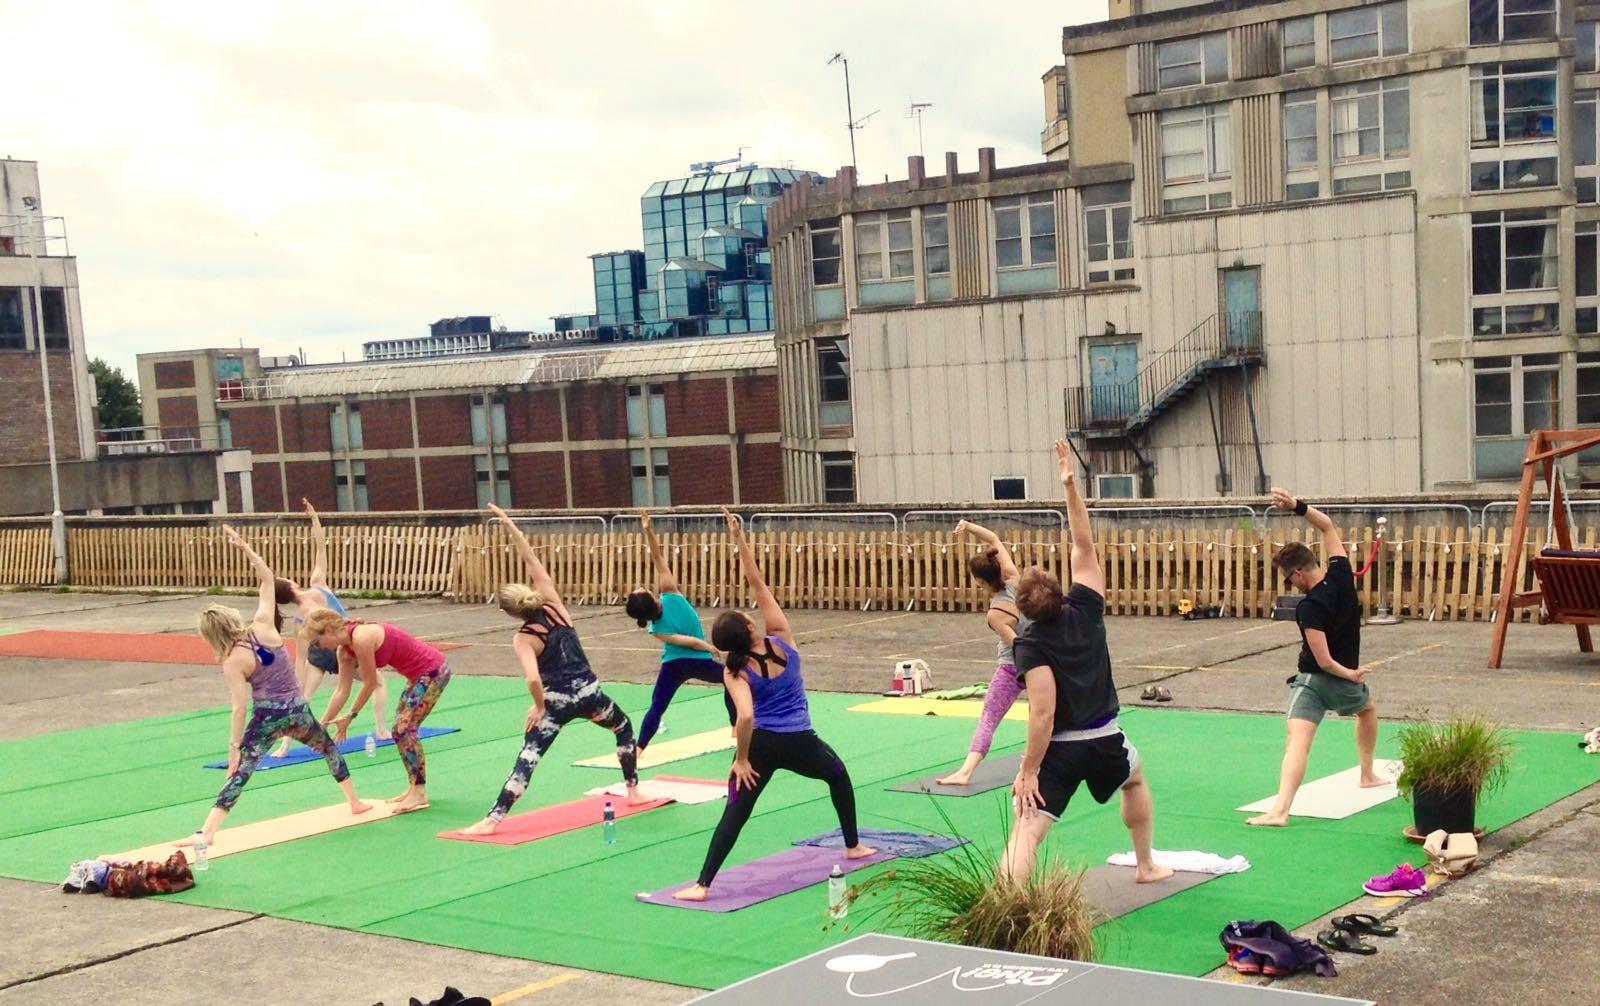 Rooftop Yoga Croydon 4, South London, The Yoga Edge